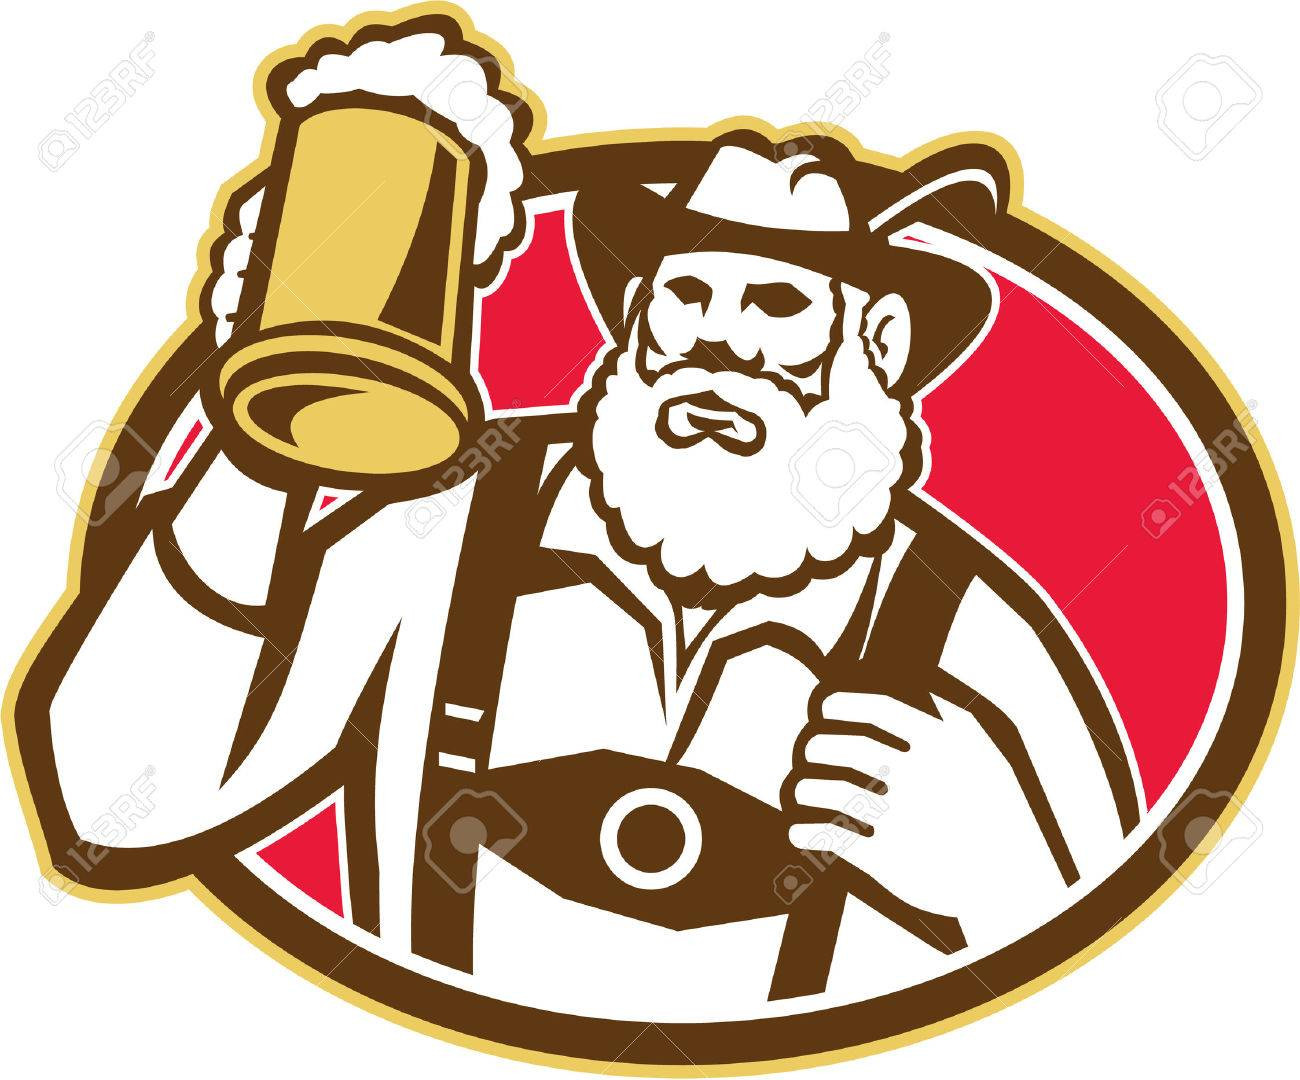 Illustration of a Bavarian beer drinker raising beer mug drinking looking up wearing lederhosen and German hat set inside oval done in retro style Stock Vector - 23203379